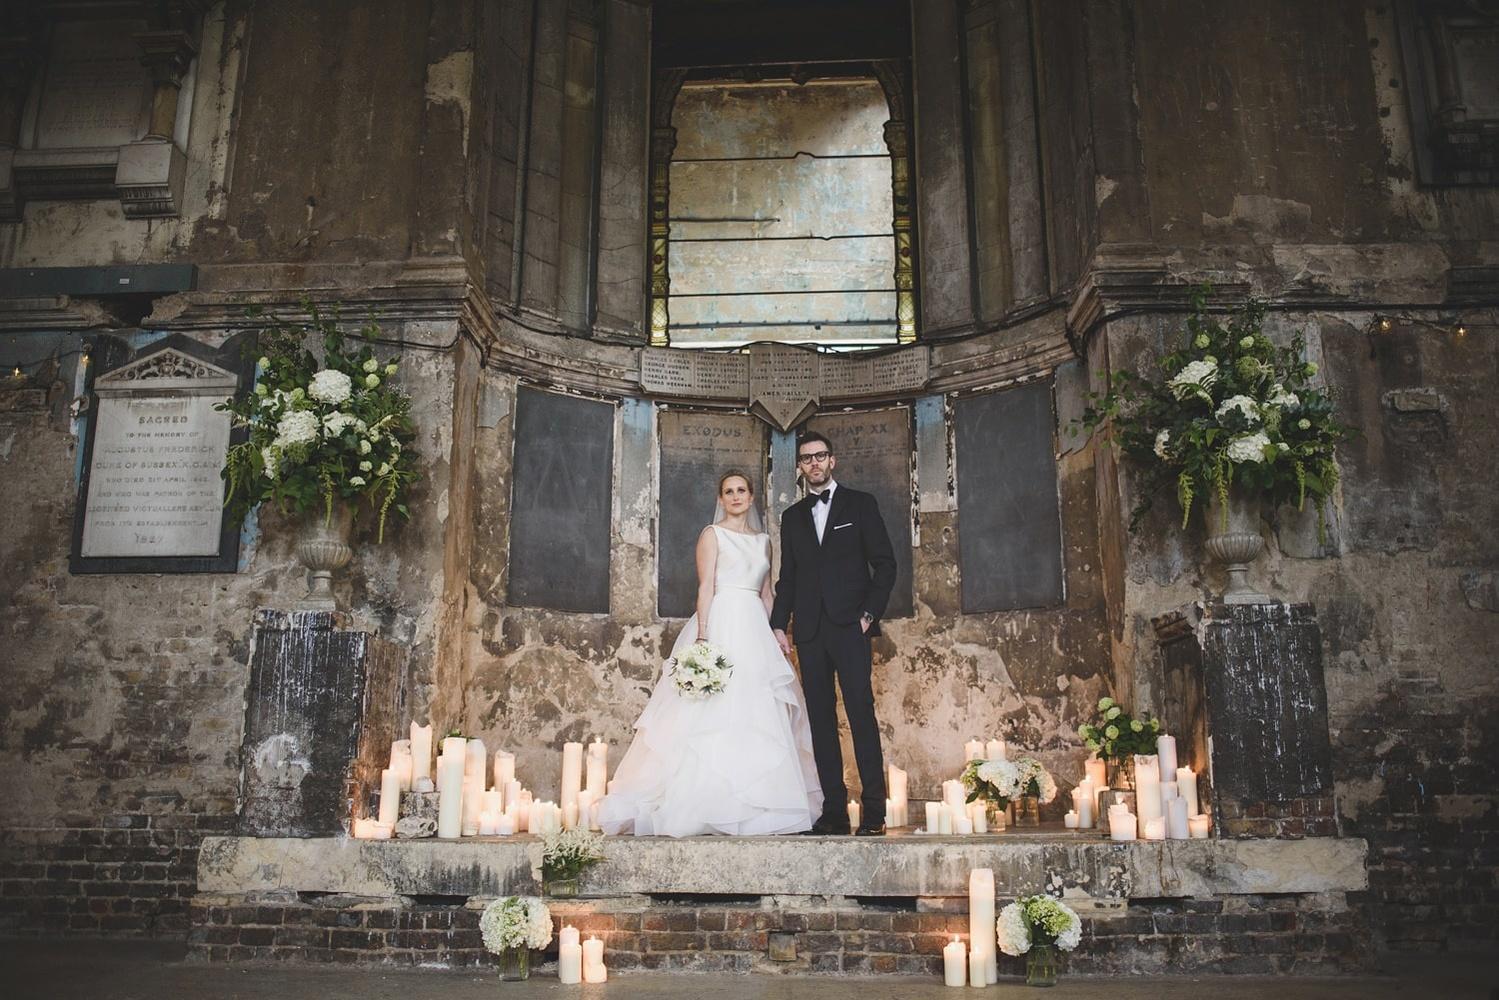 London wedding photography by Rik Pennington